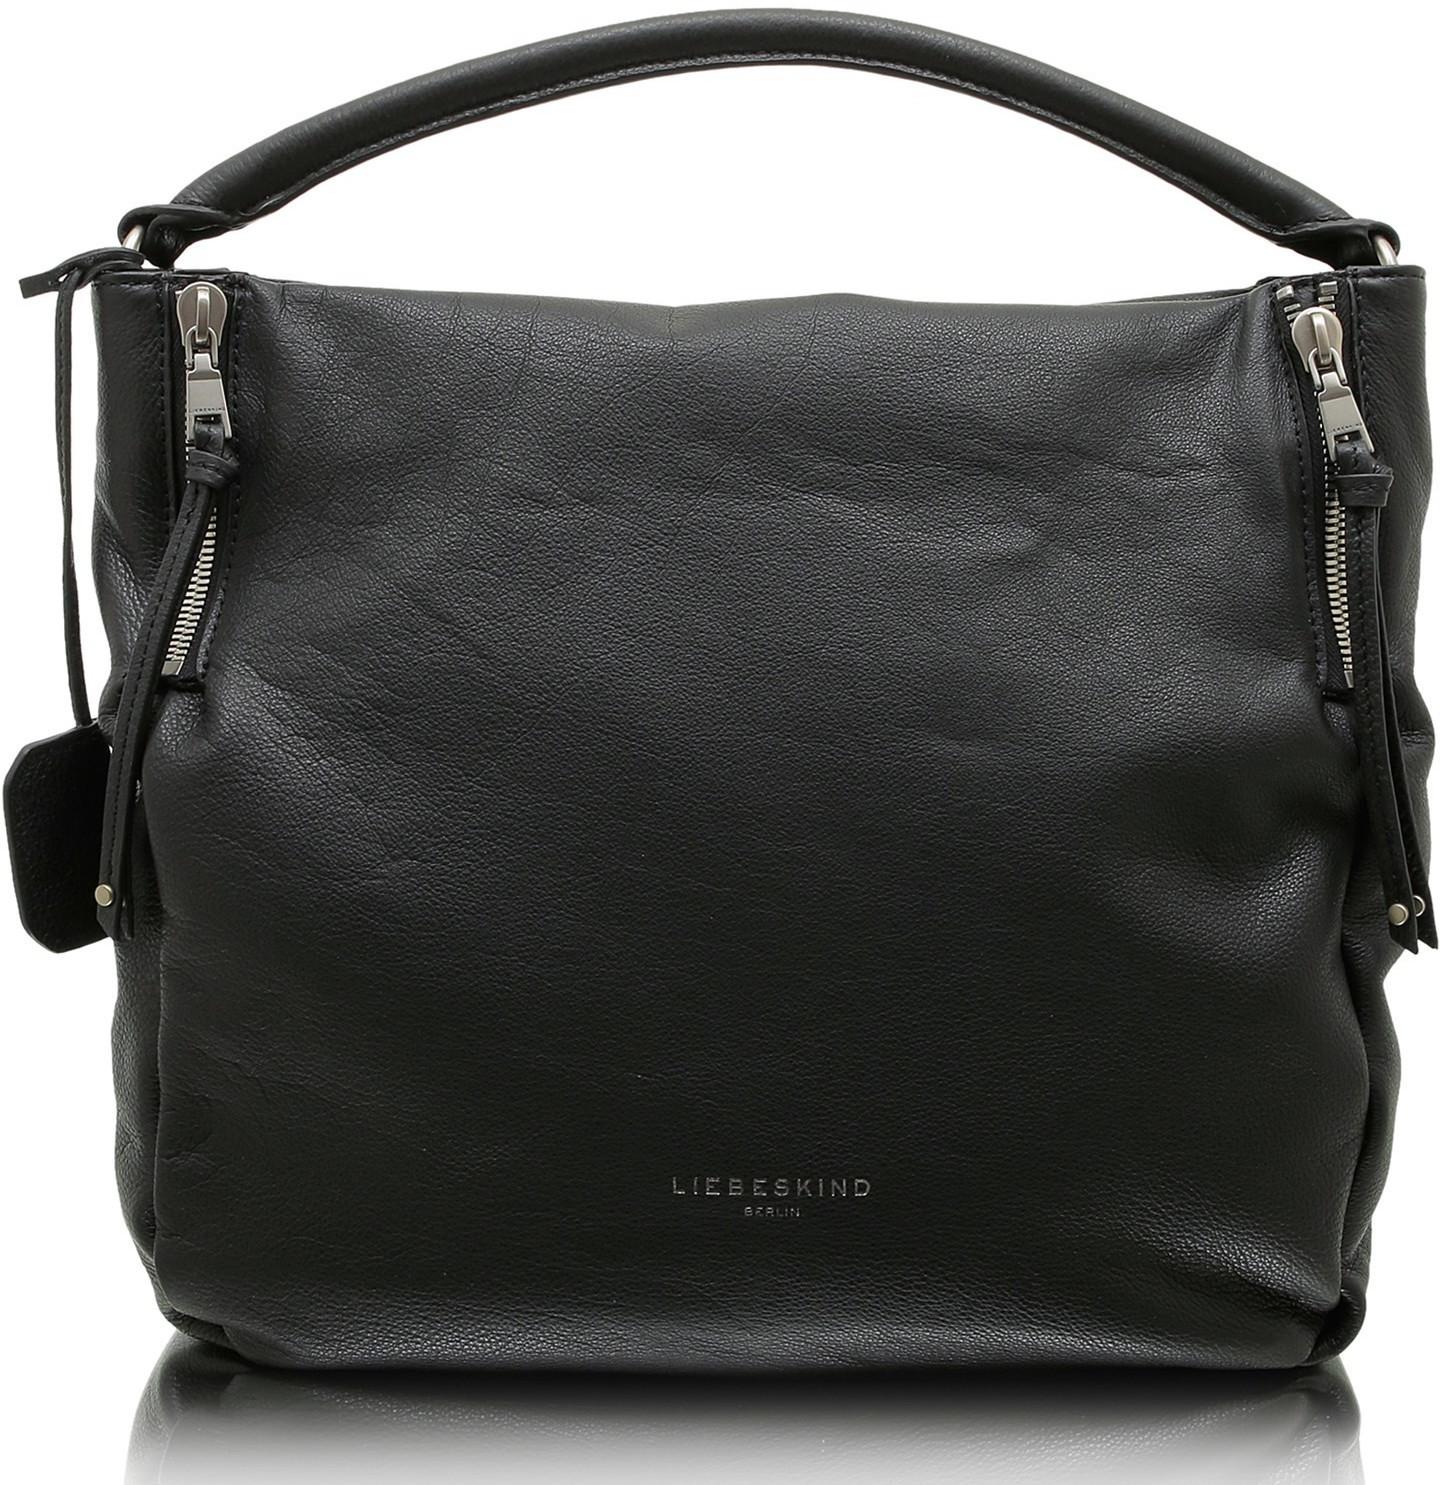 Liebeskind Vintage Kano black (T1.803.94.4053)